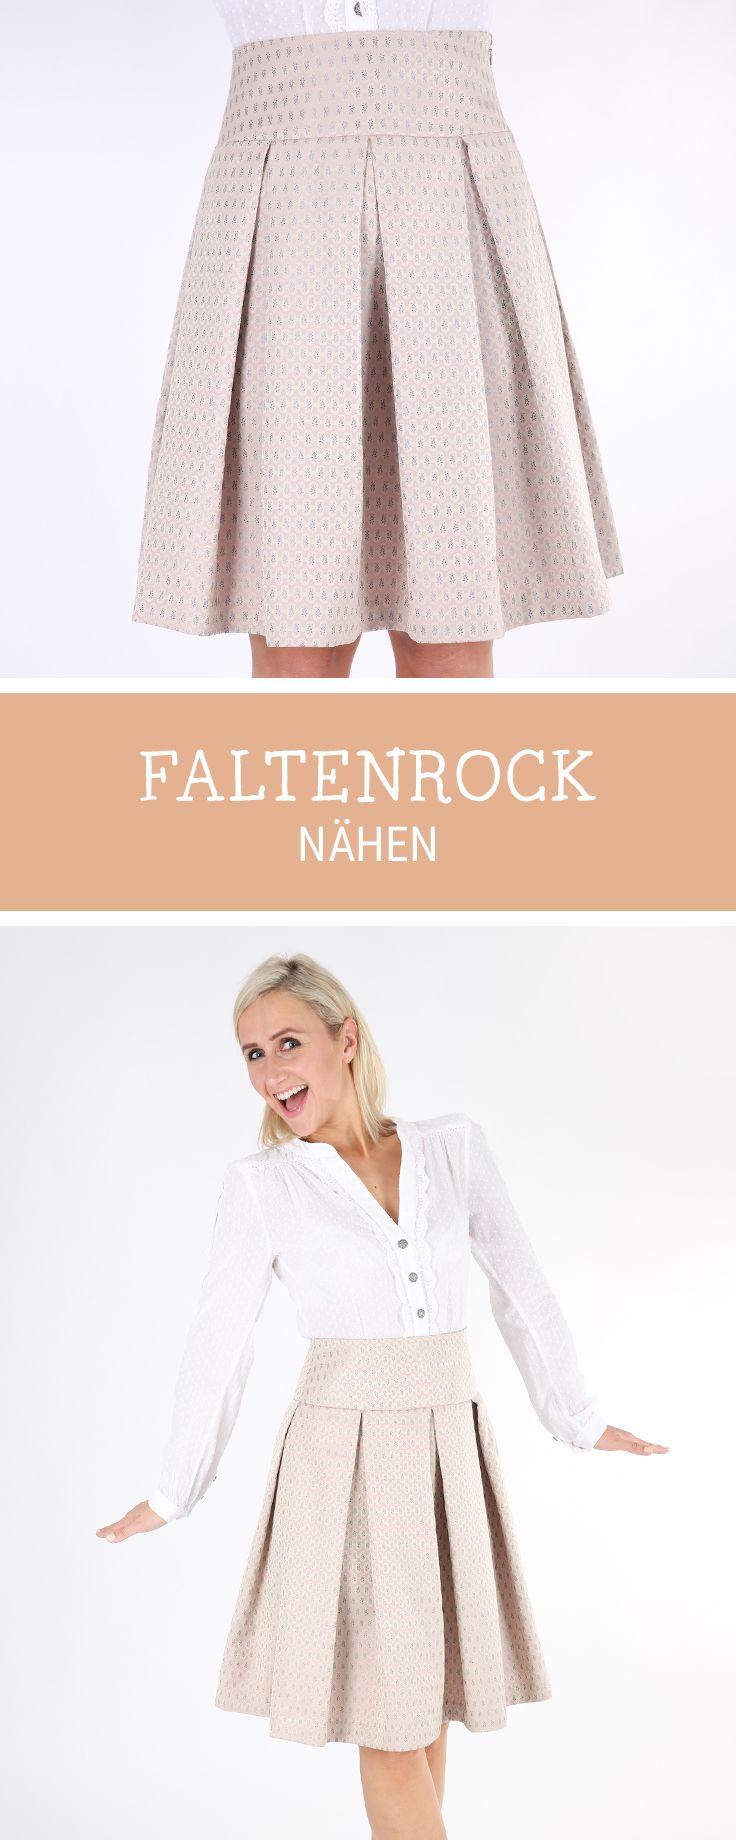 Entdecke die #Nähanleitung für einen knielangen #Faltenrock, DIY-Tutorial / #diy sewing tutorial for fifties plaid #skirt via DaWanda.com